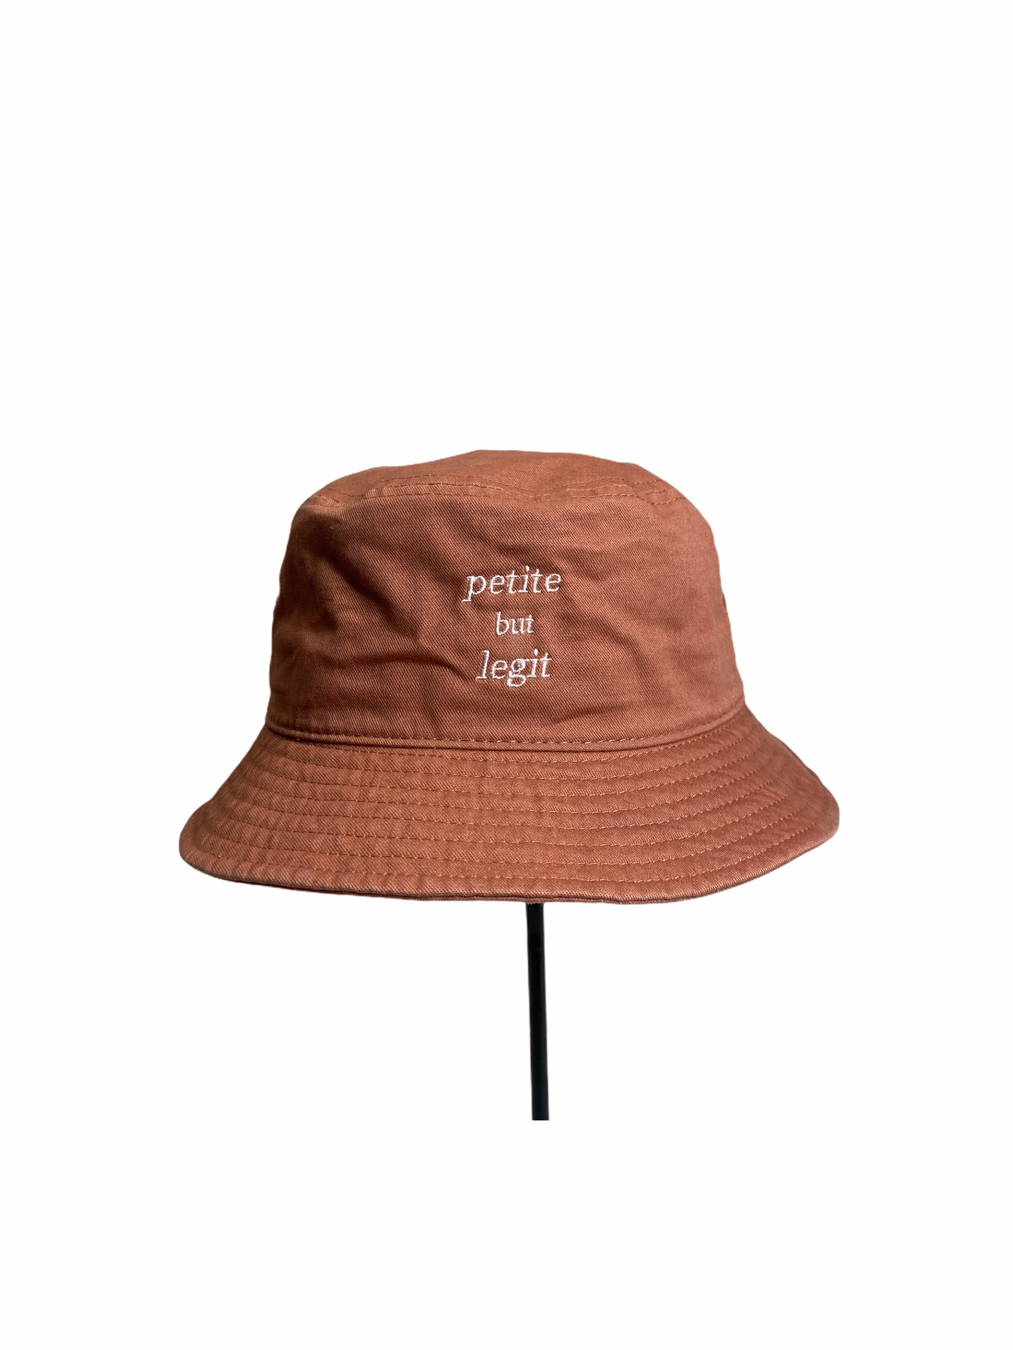 Petite But Legit Bucket Hat (Sandstone)